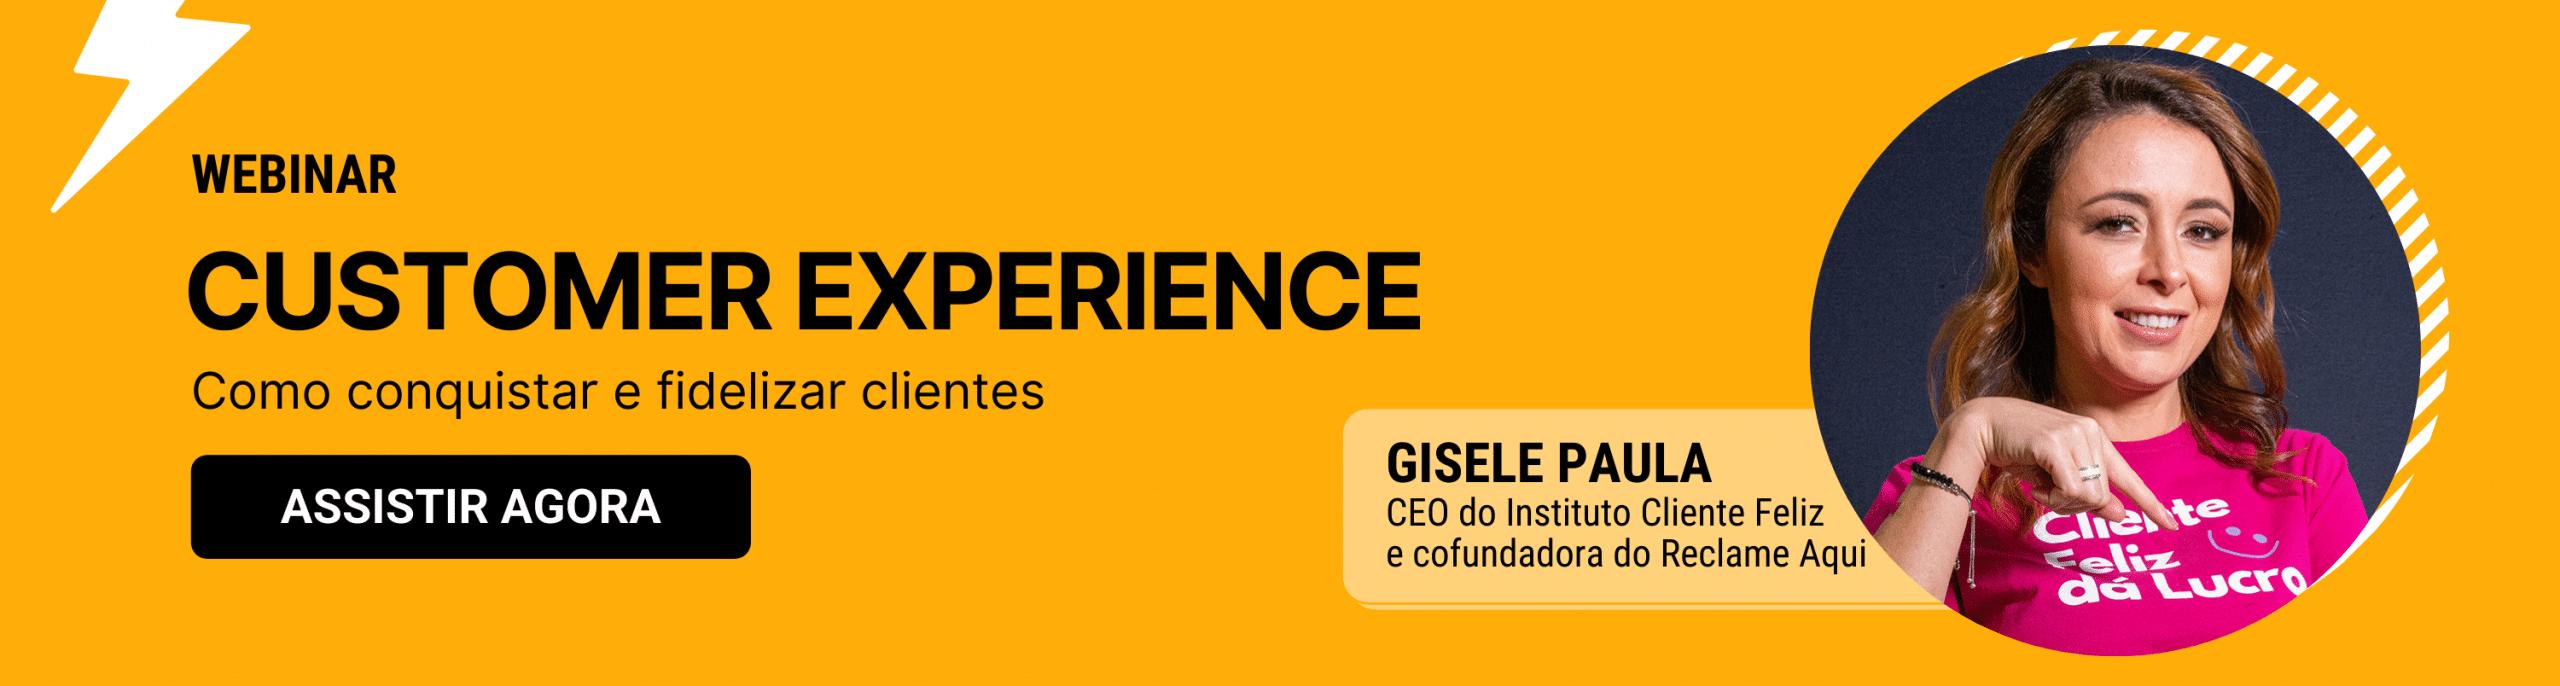 Customer Experience - Webinar - Gisele Paula